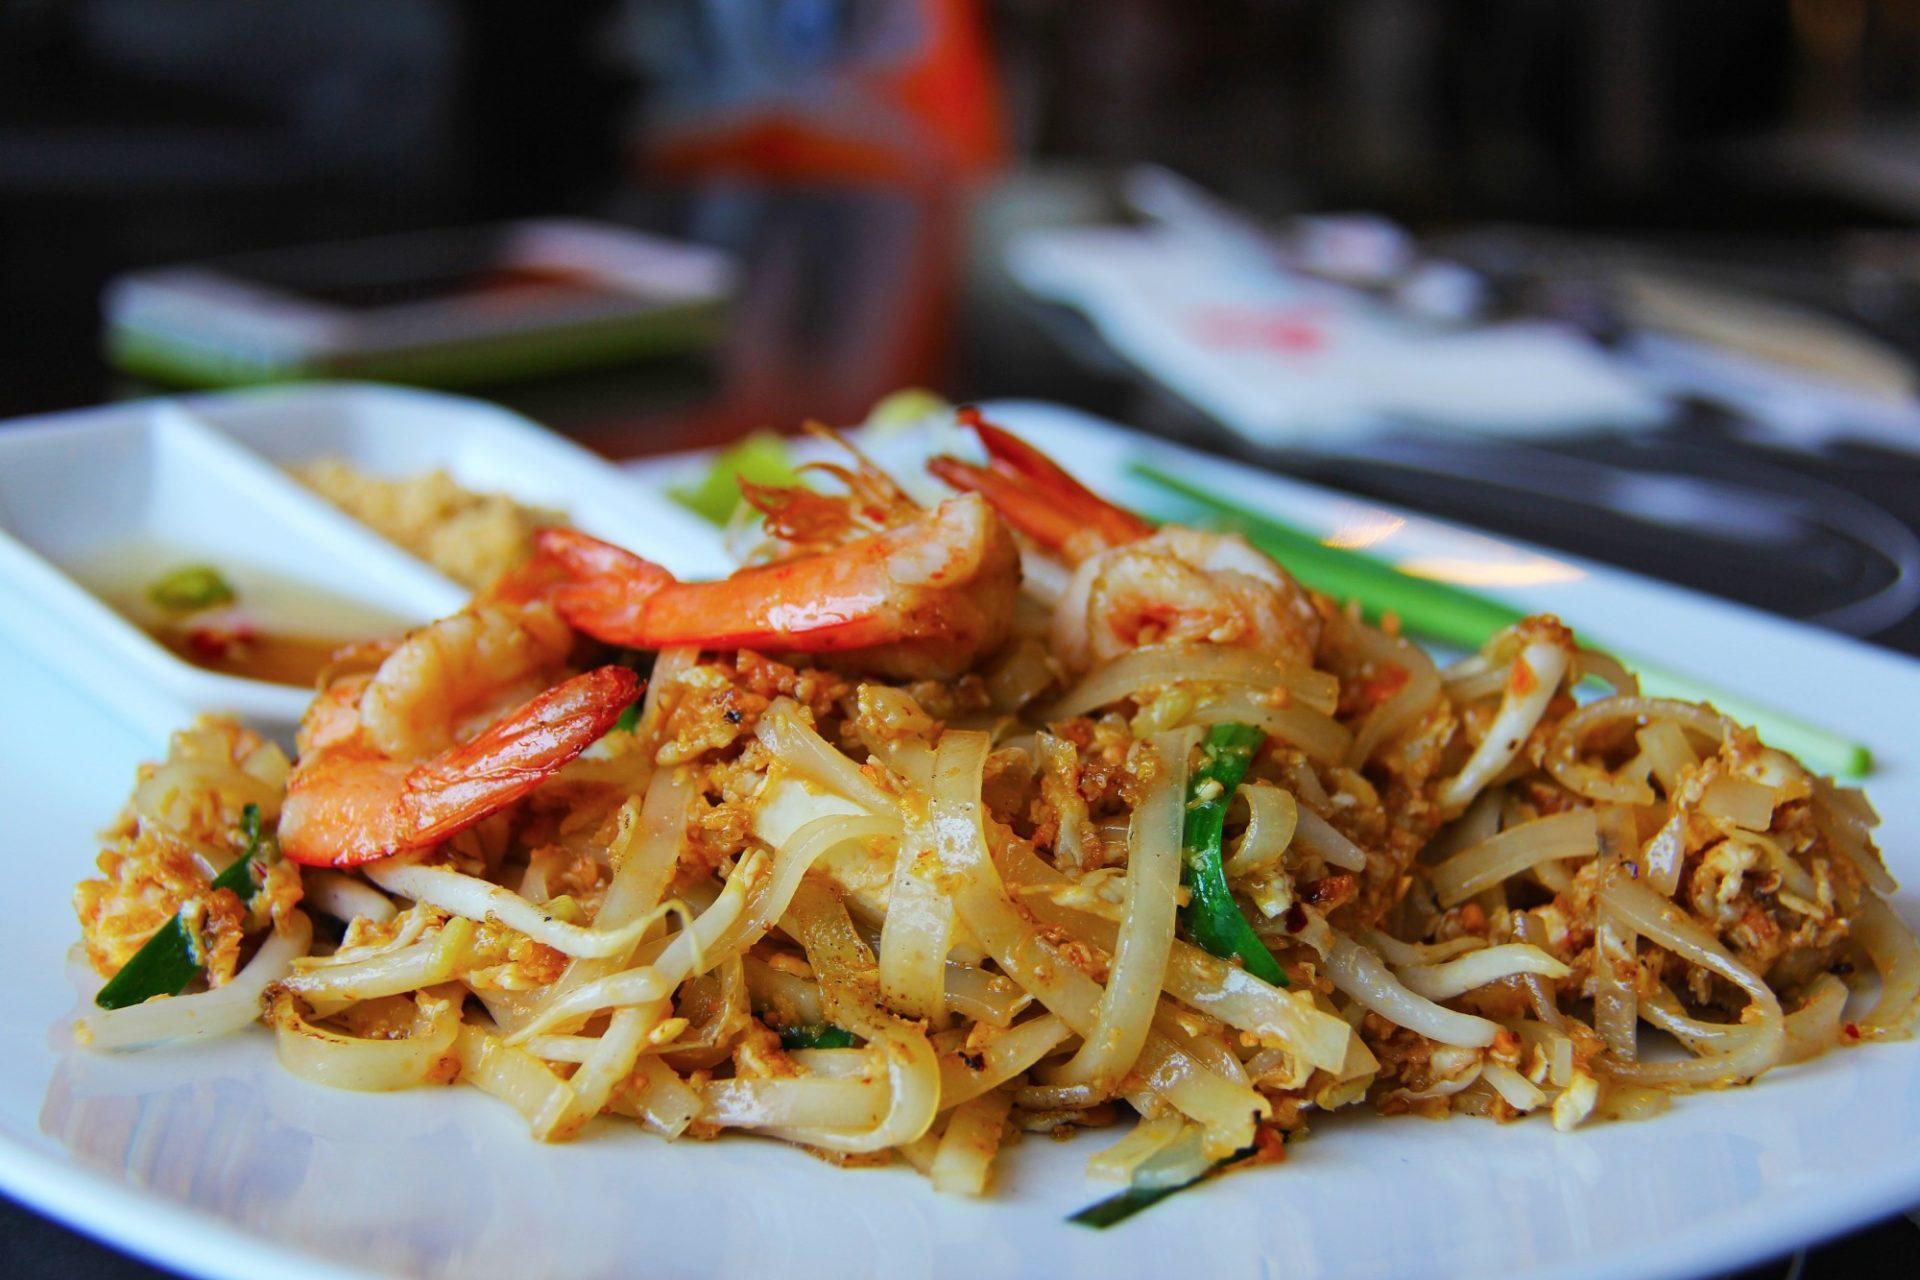 What Does Pad Thai Taste Like?